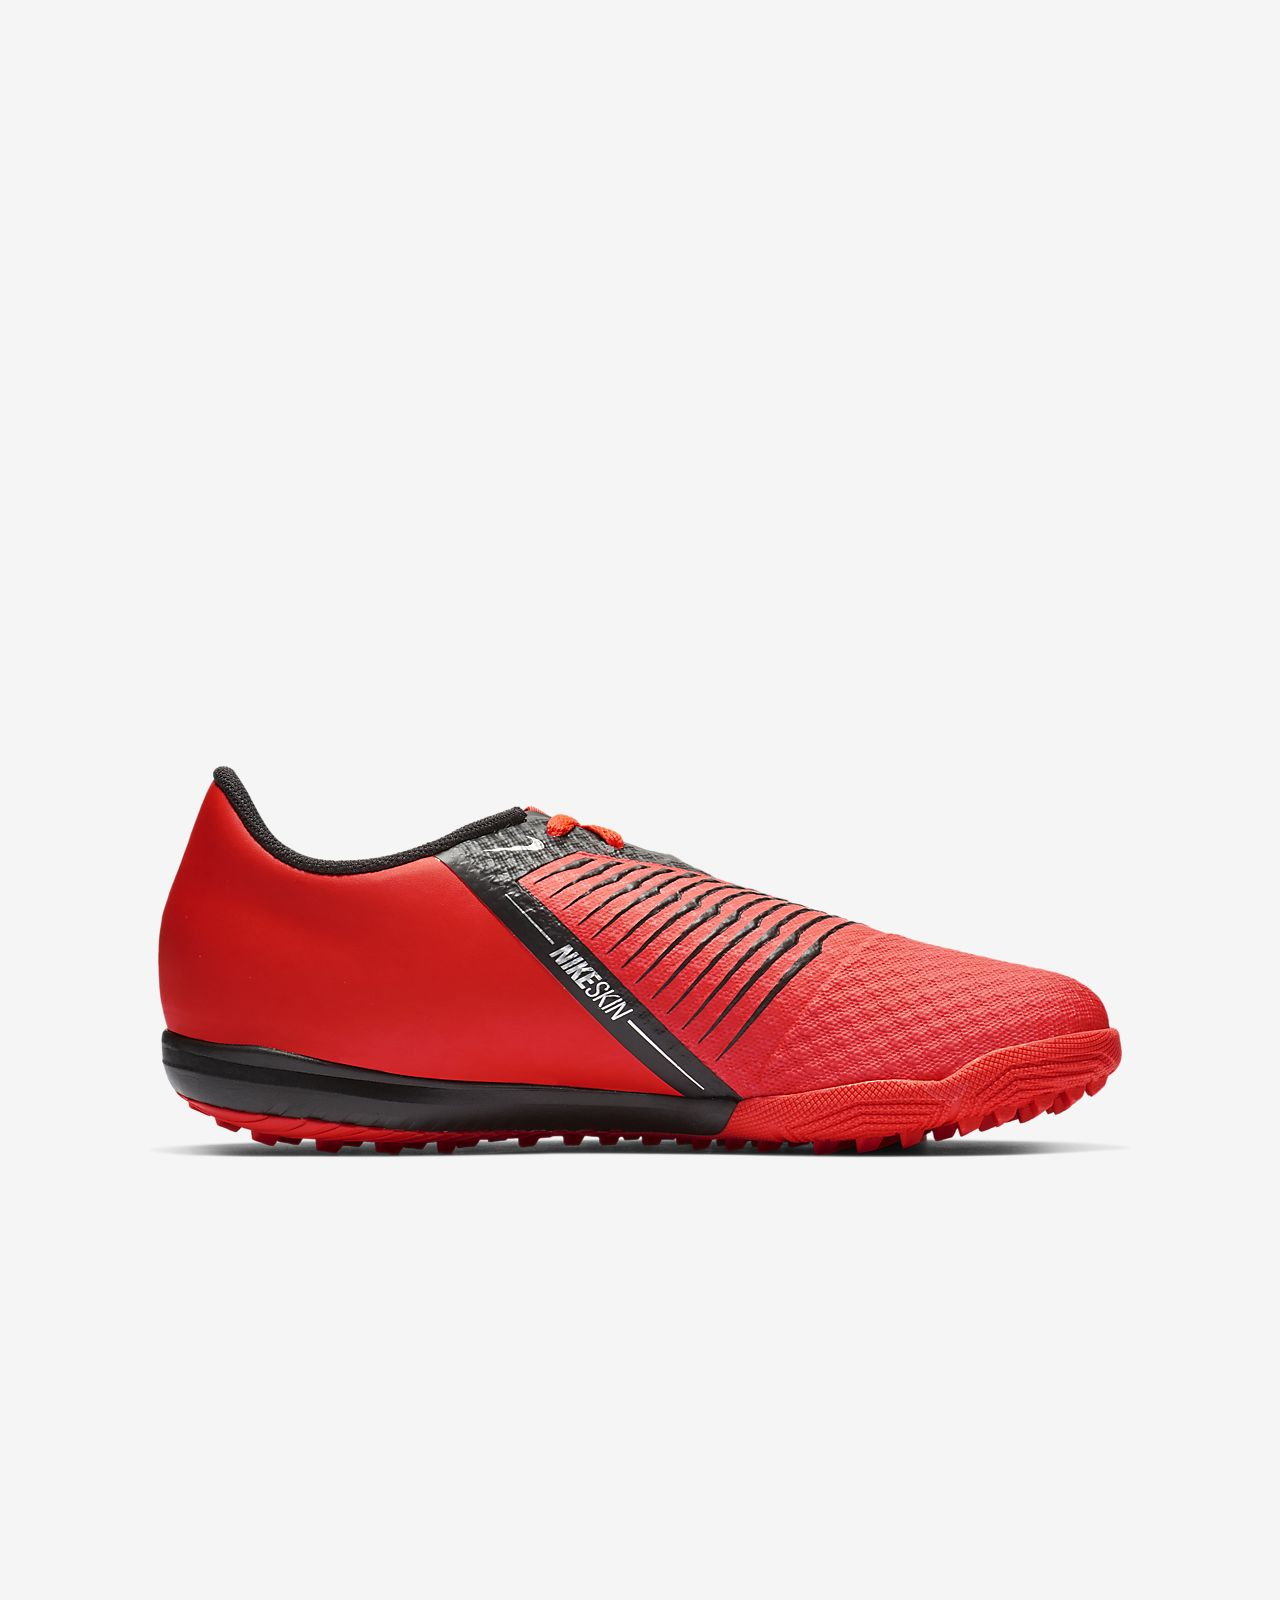 7139f8994 ... Nike Jr. Phantom Venom Academy TF Younger Older Kids  Turf Football Shoe